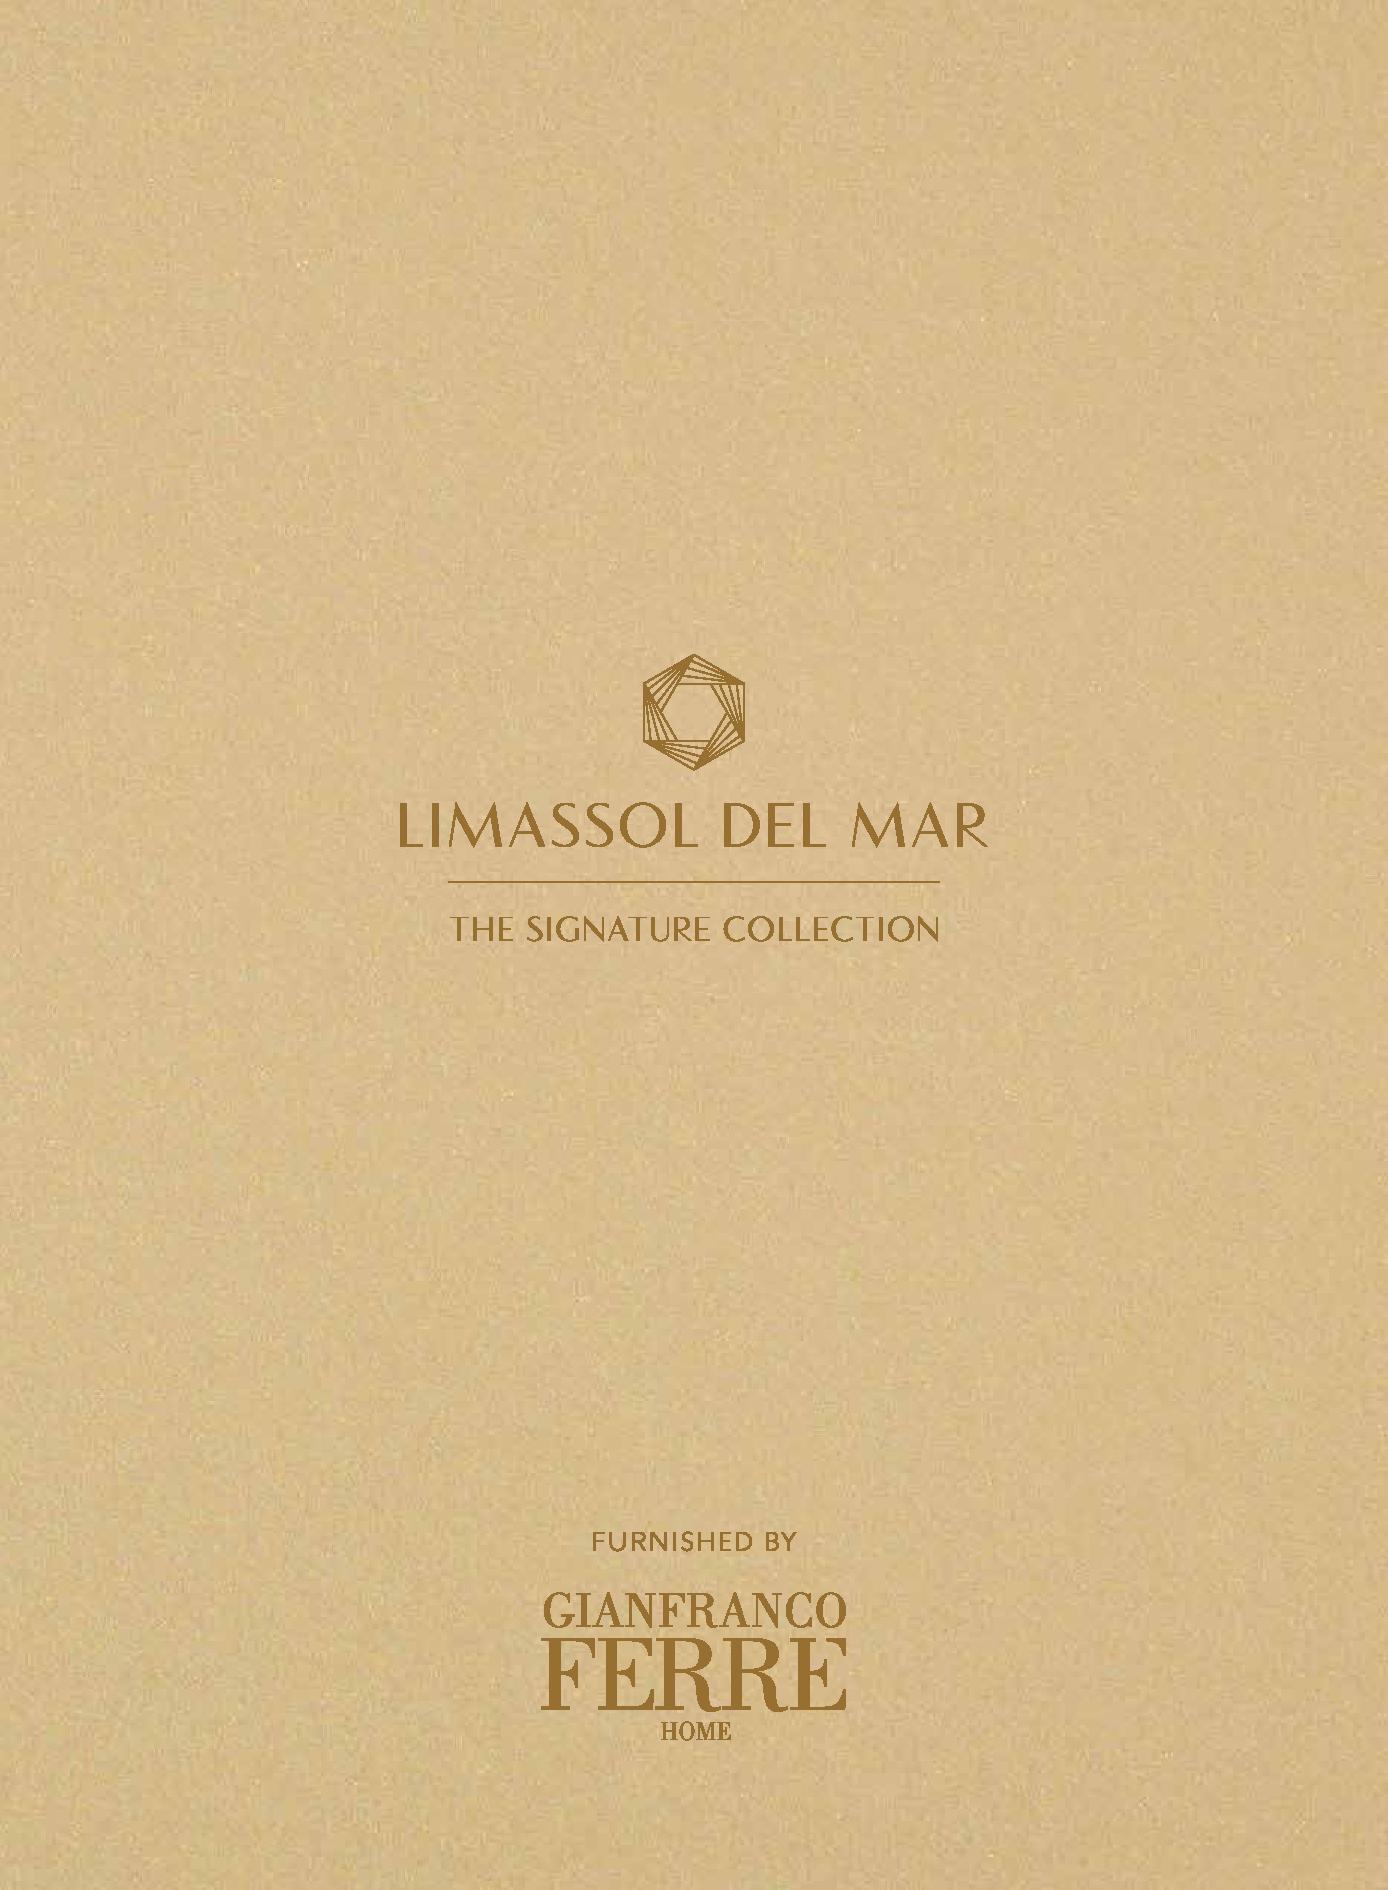 Limassol del Mar: The Signature Collection